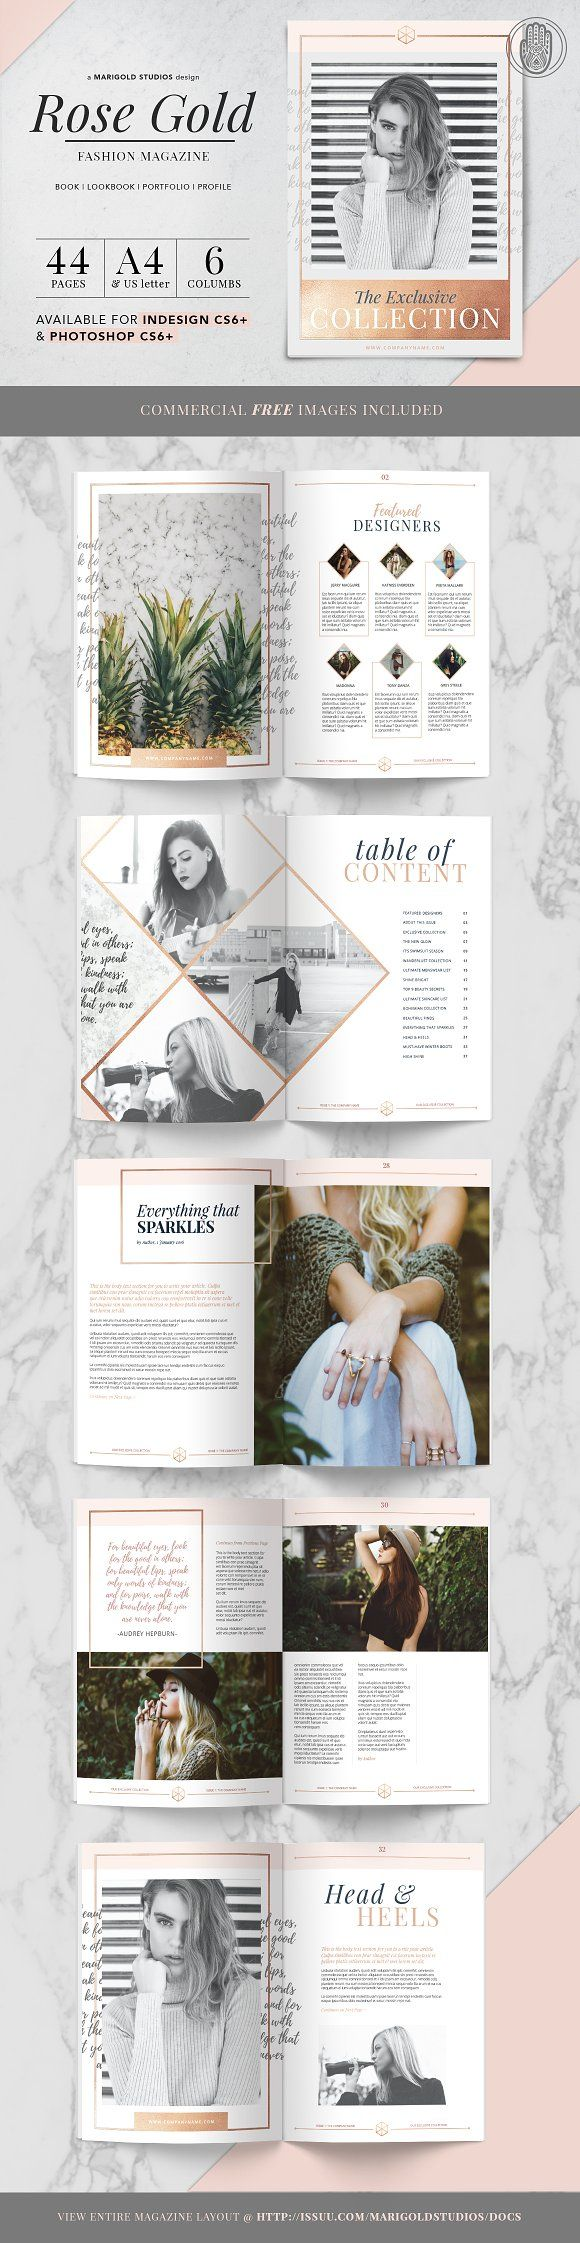 ROSE GOLD | Magazine by Marigold Studios on Creati…